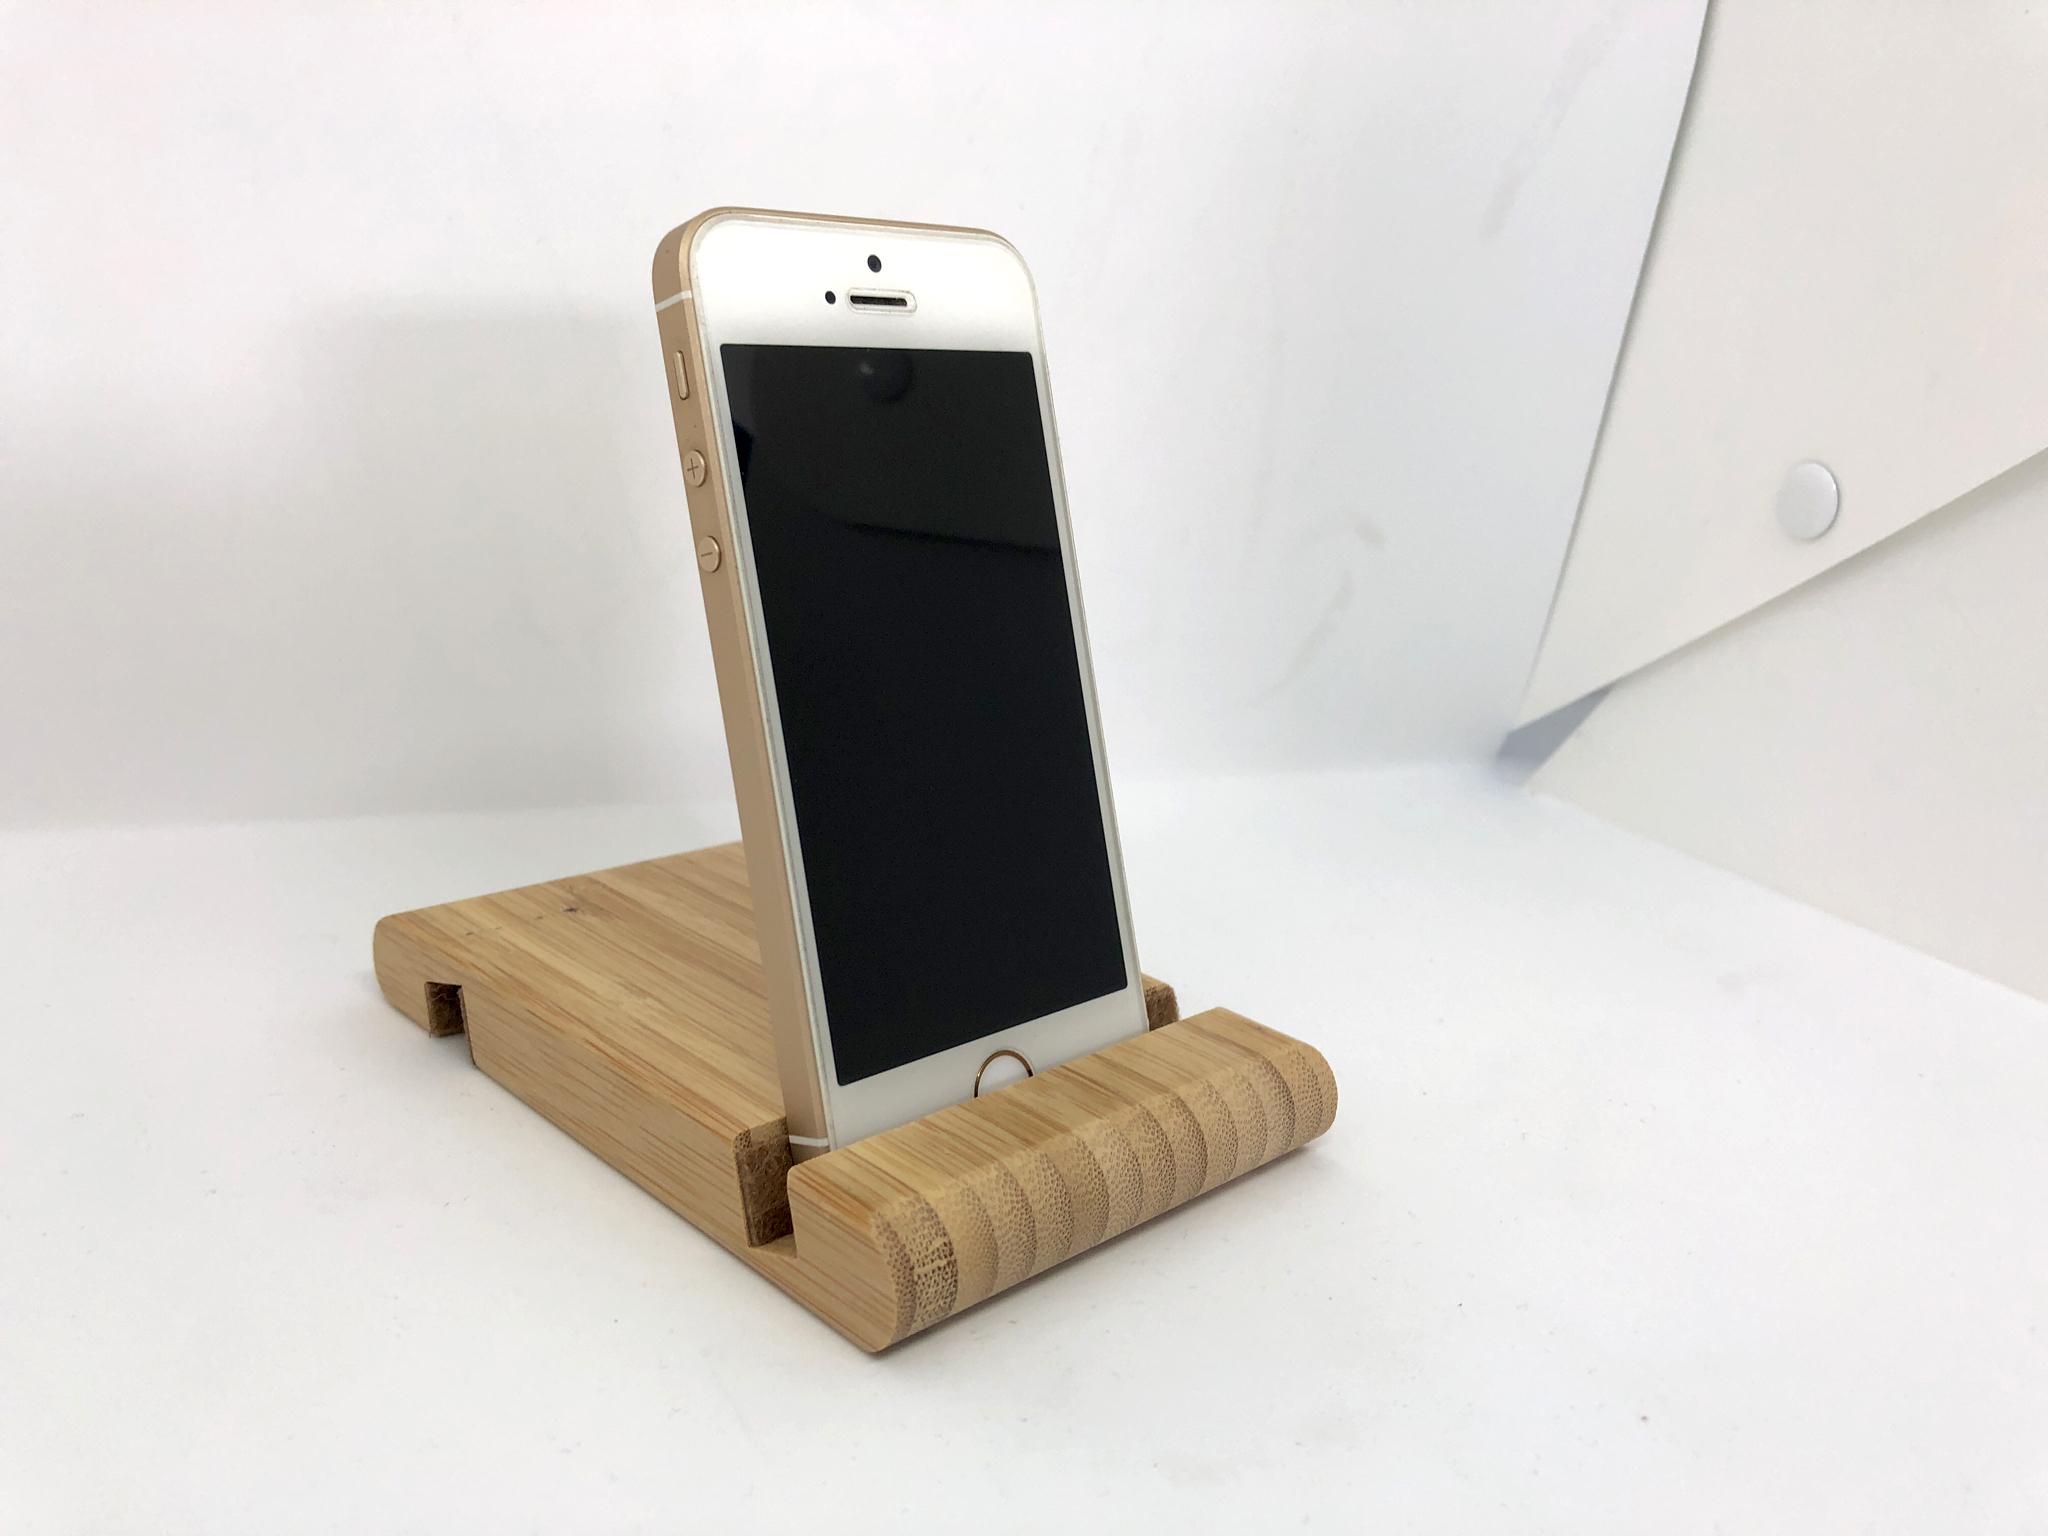 iPhone SE 16GB, 16 GB, Gold, Afbeelding 1